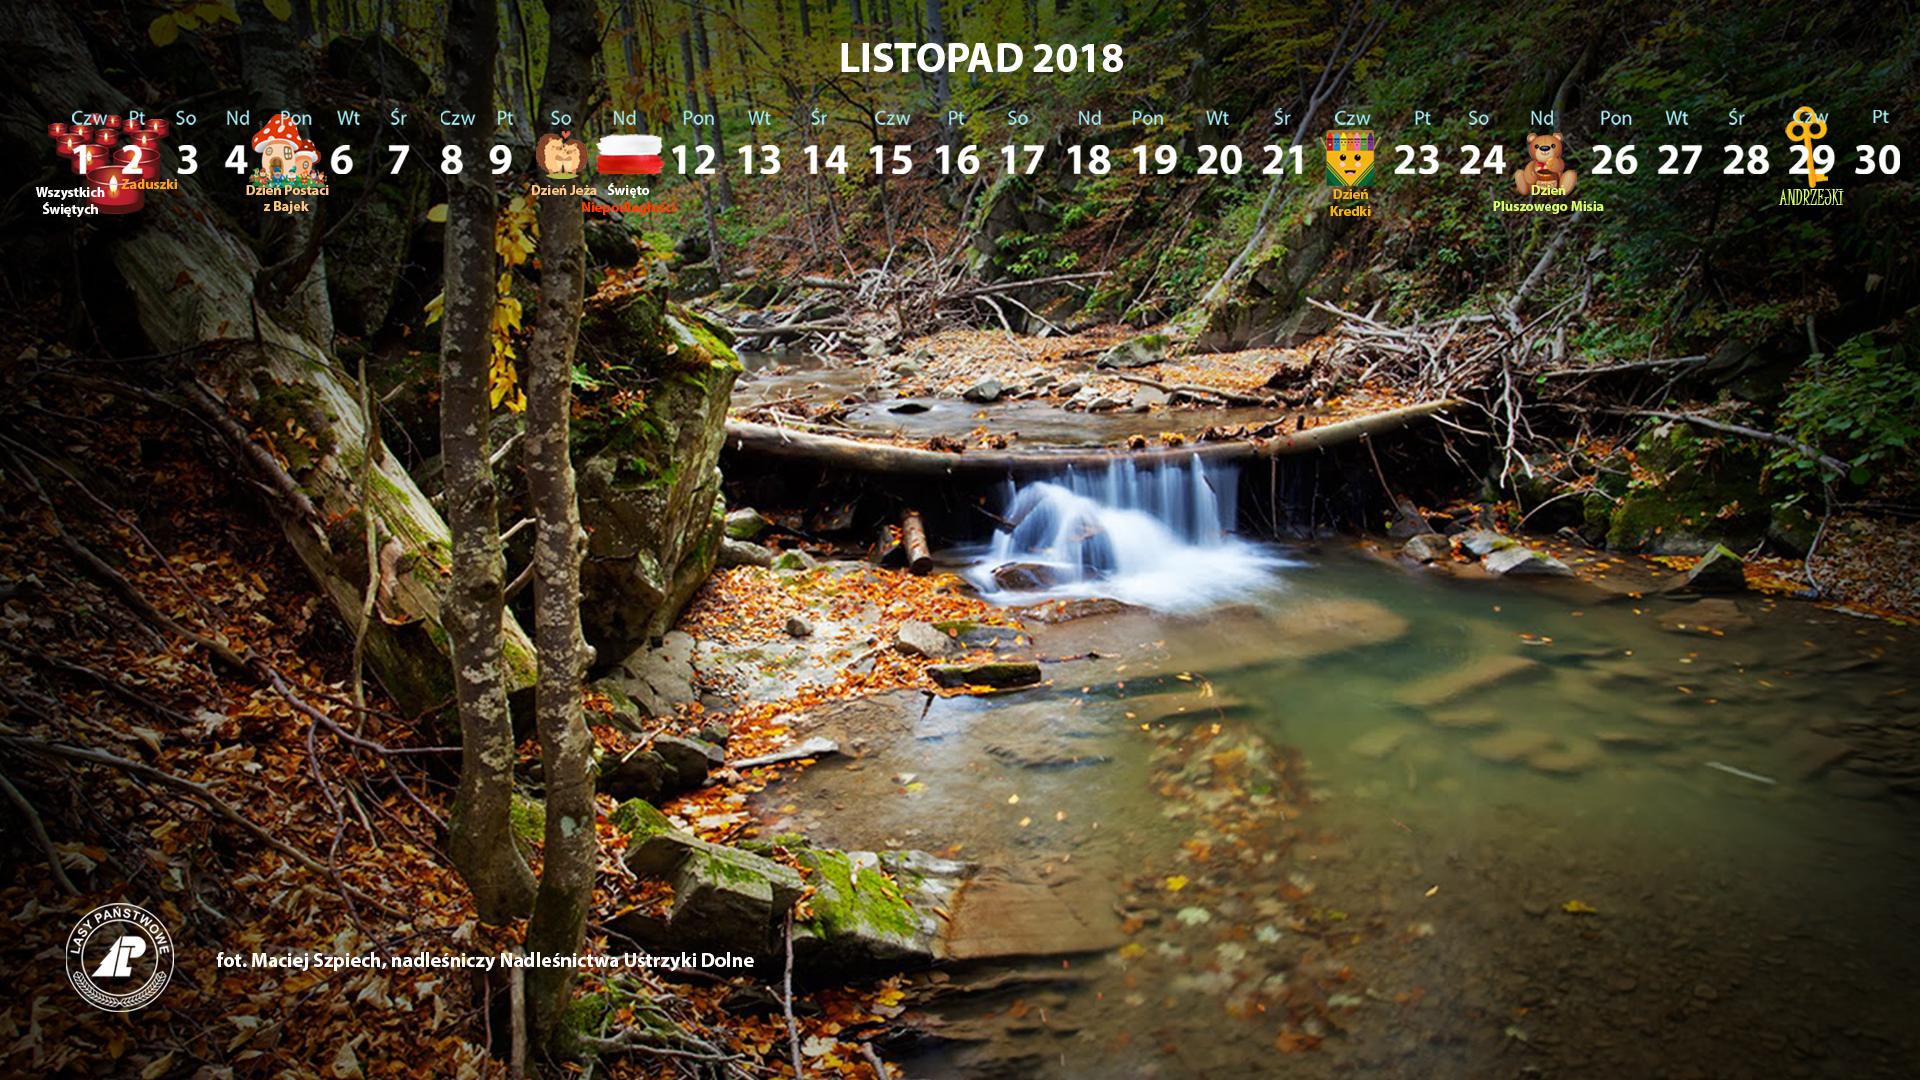 Kalendarz_listopad_2018_1920x1080[1].jpg